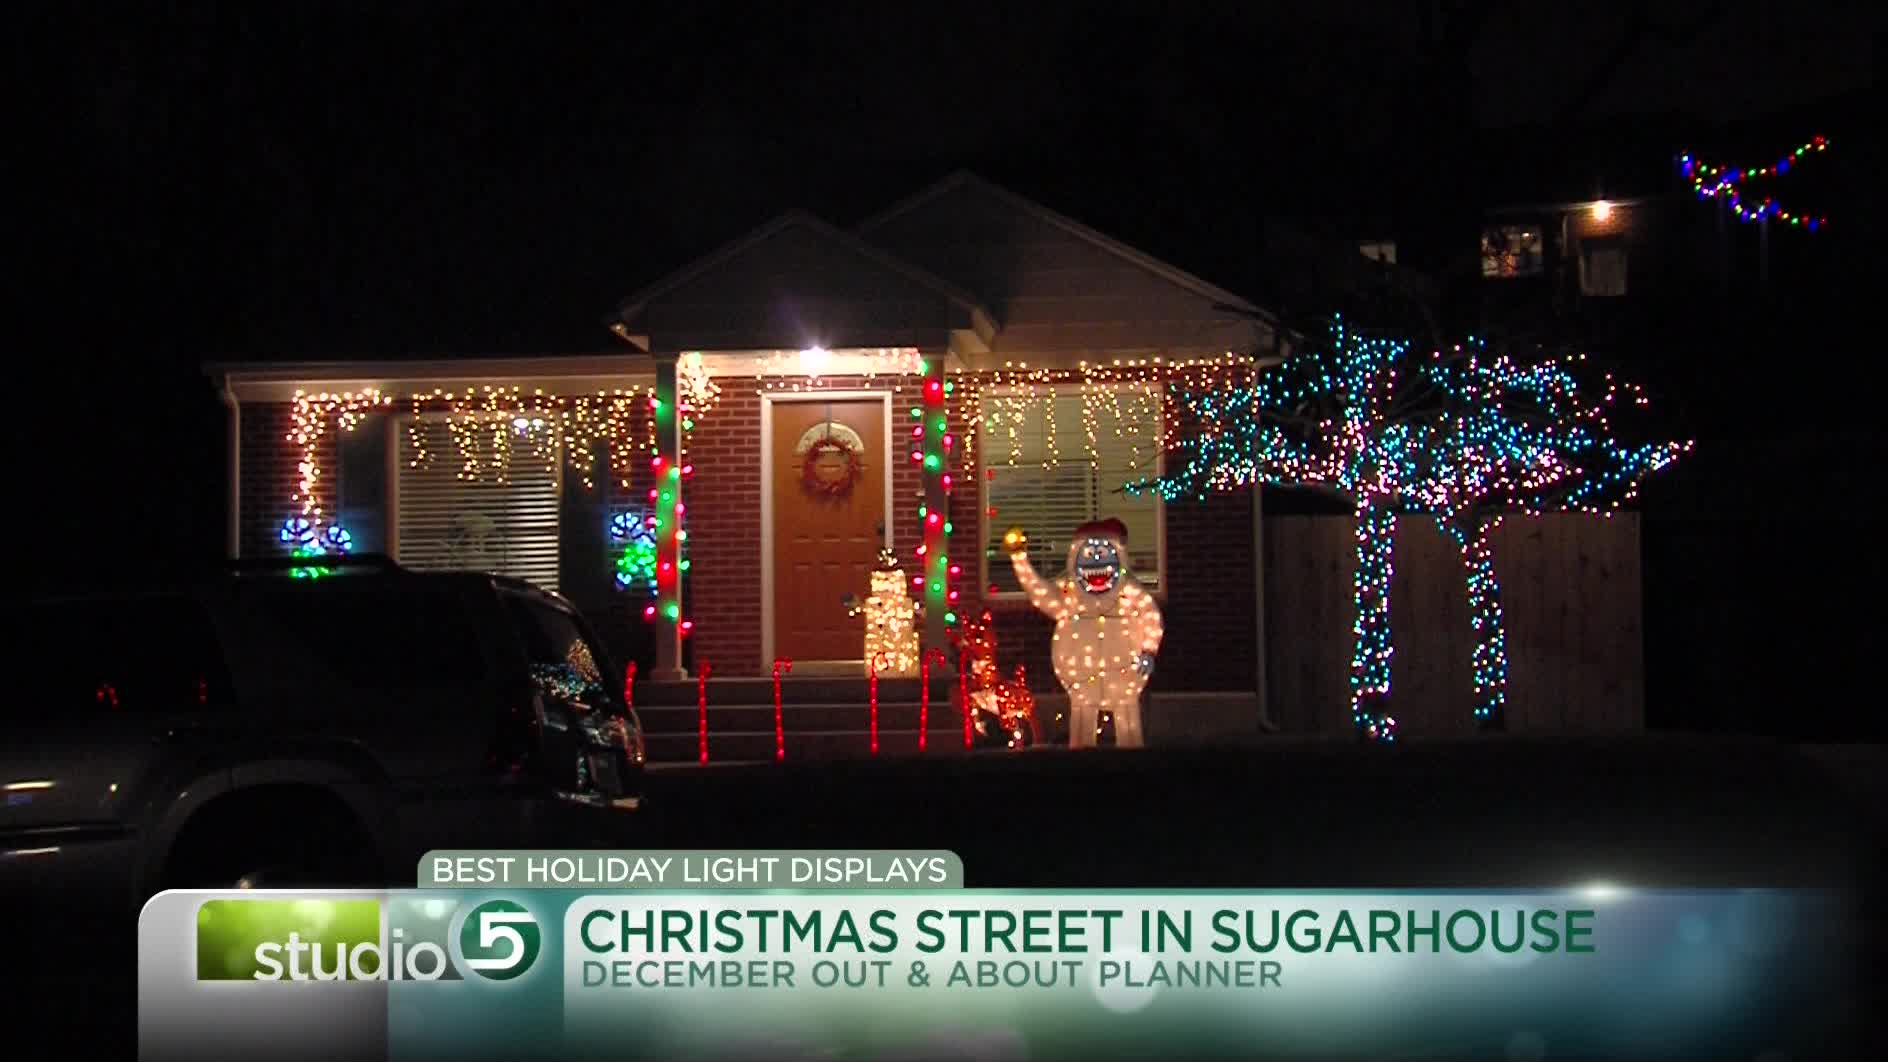 Studio 5 - Best Christmas Light Displays